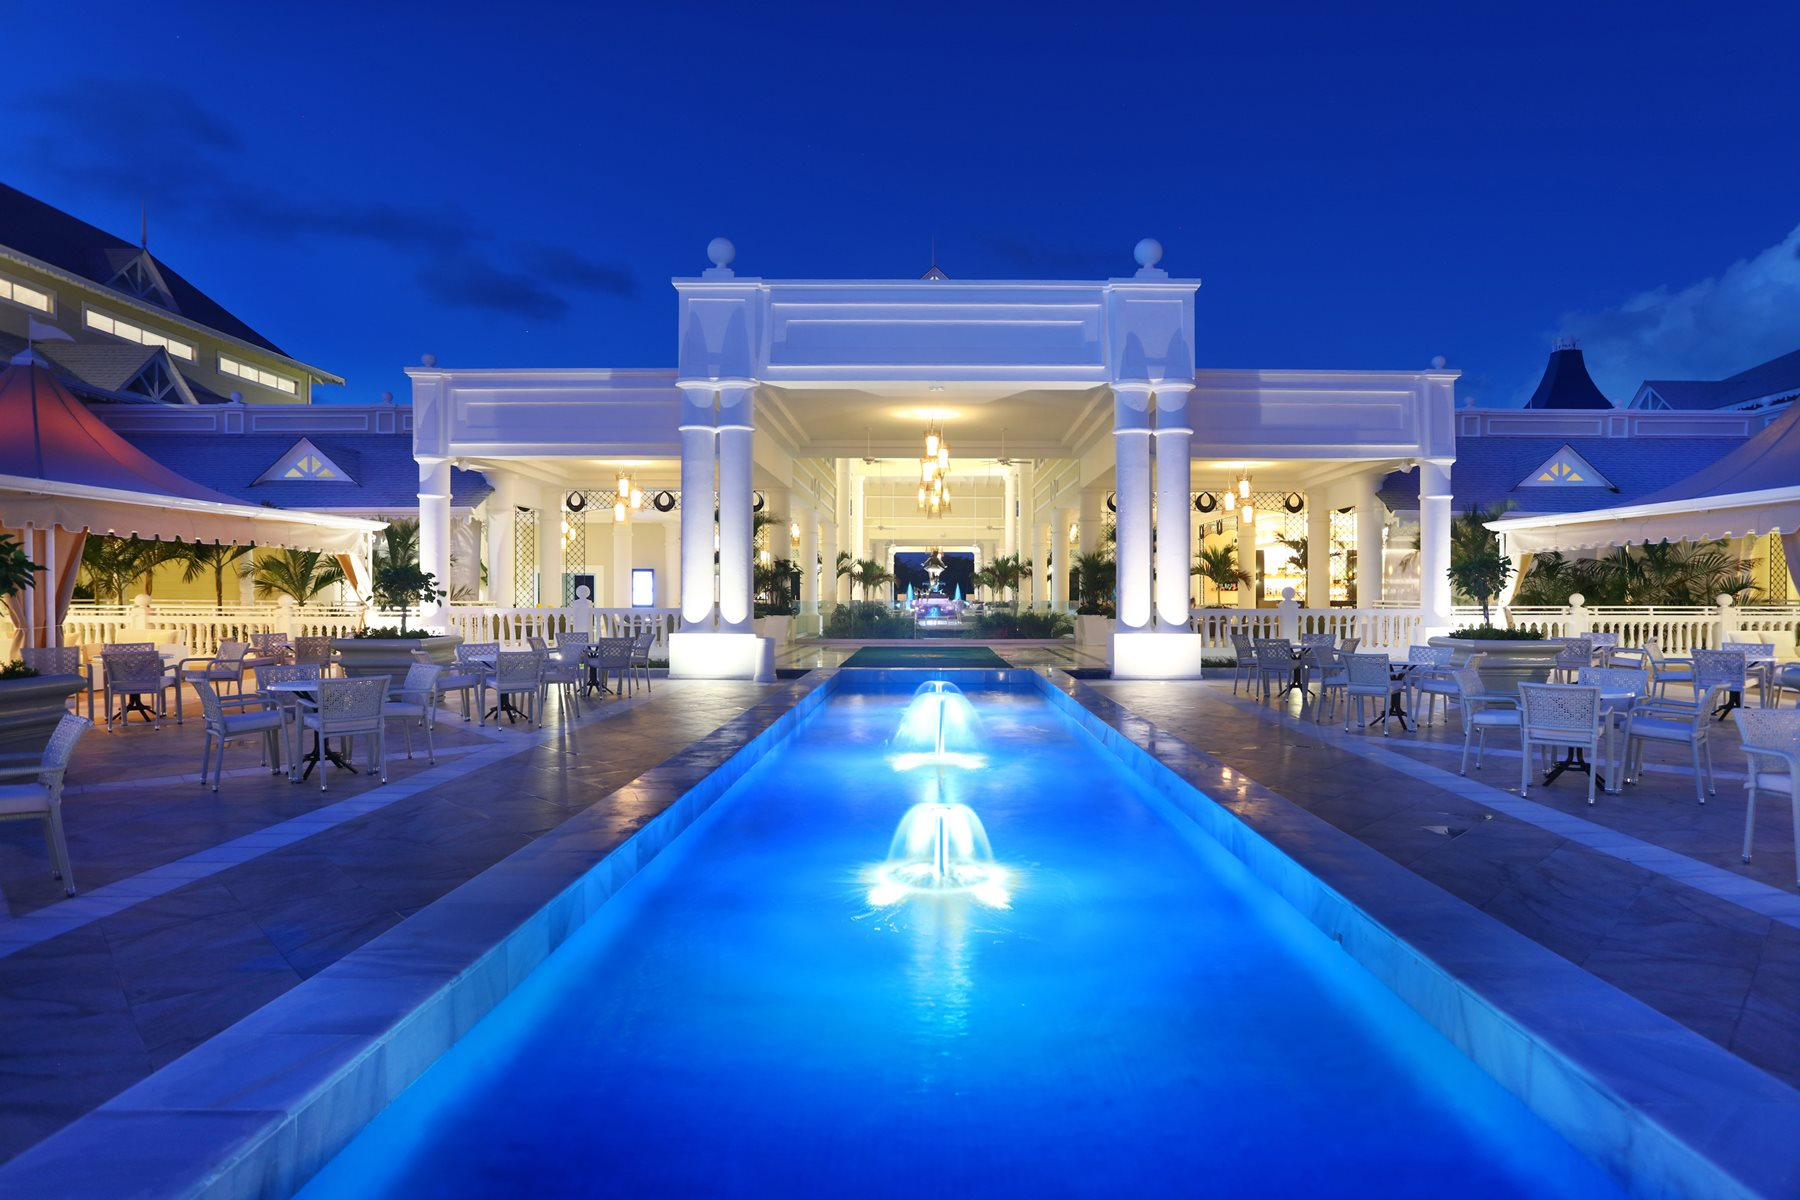 Luxury-Bahia-Principe-Fantasia-Lobby-003